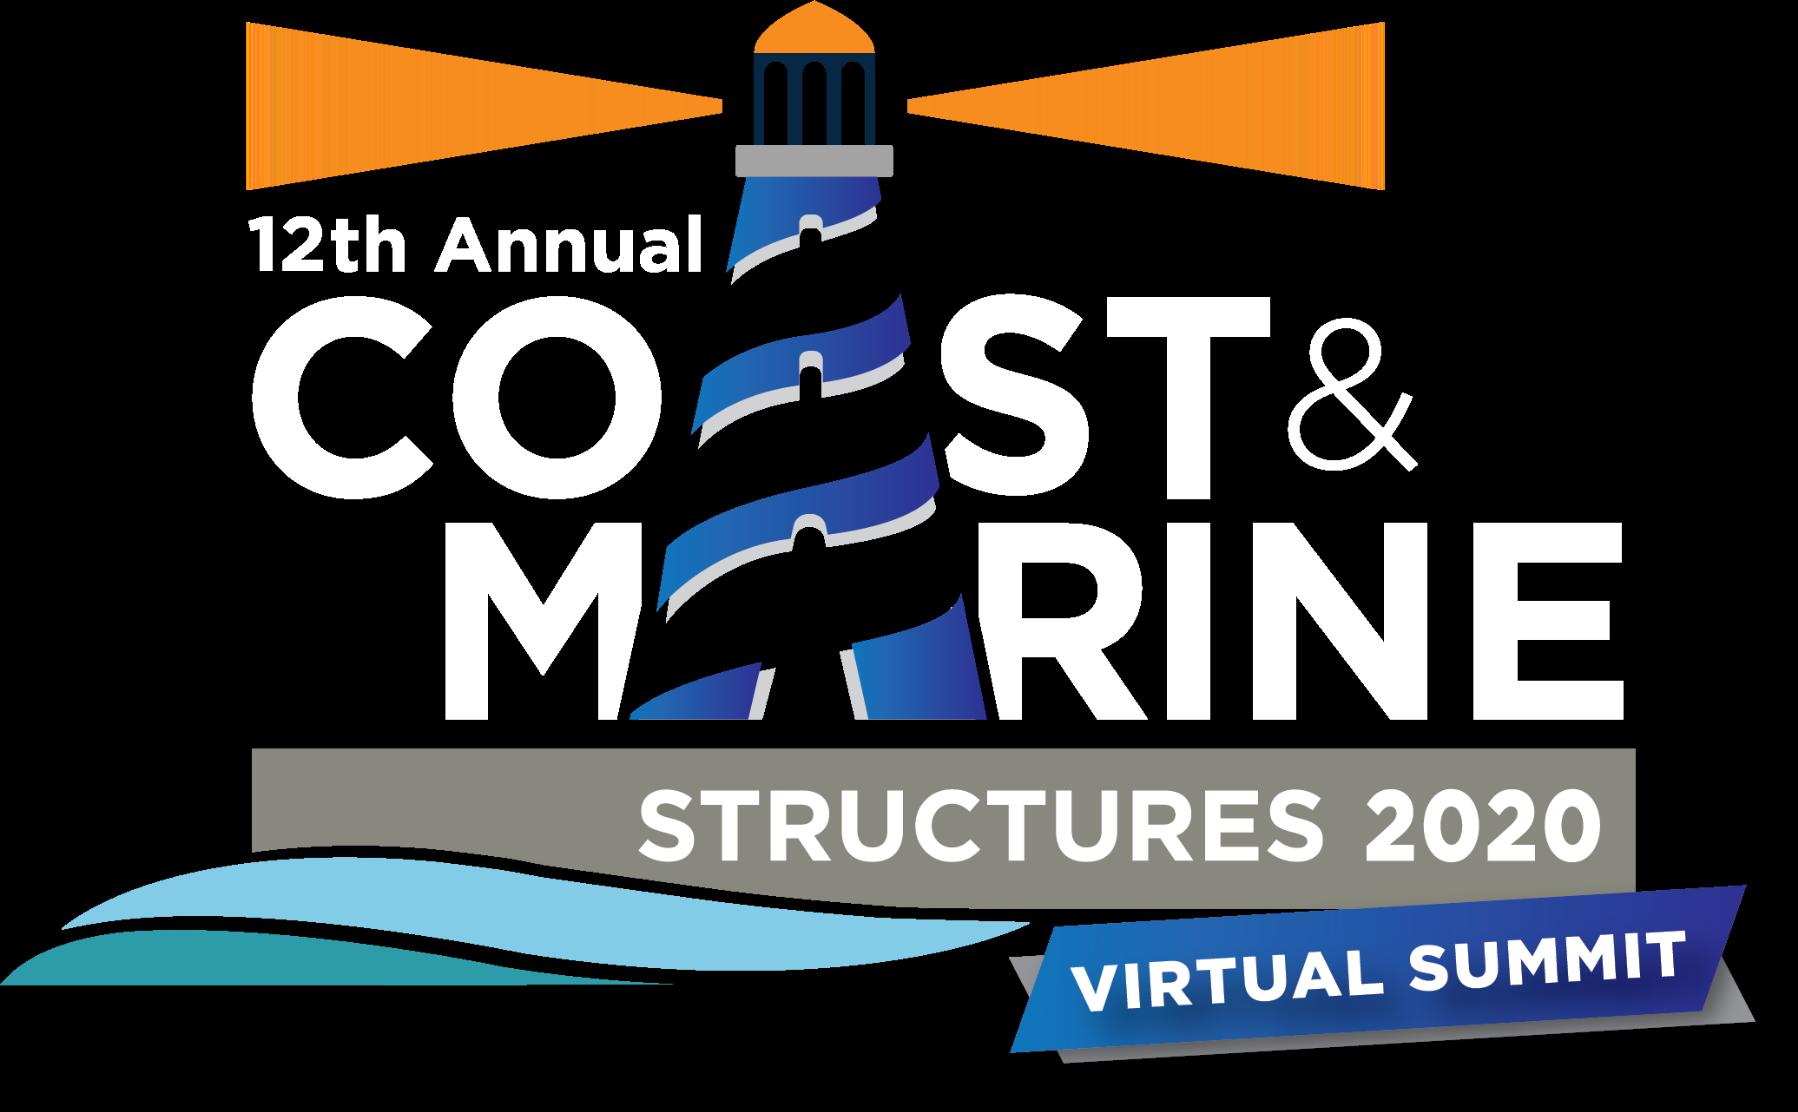 12th Annual Coast & Marine Online Summit 2020